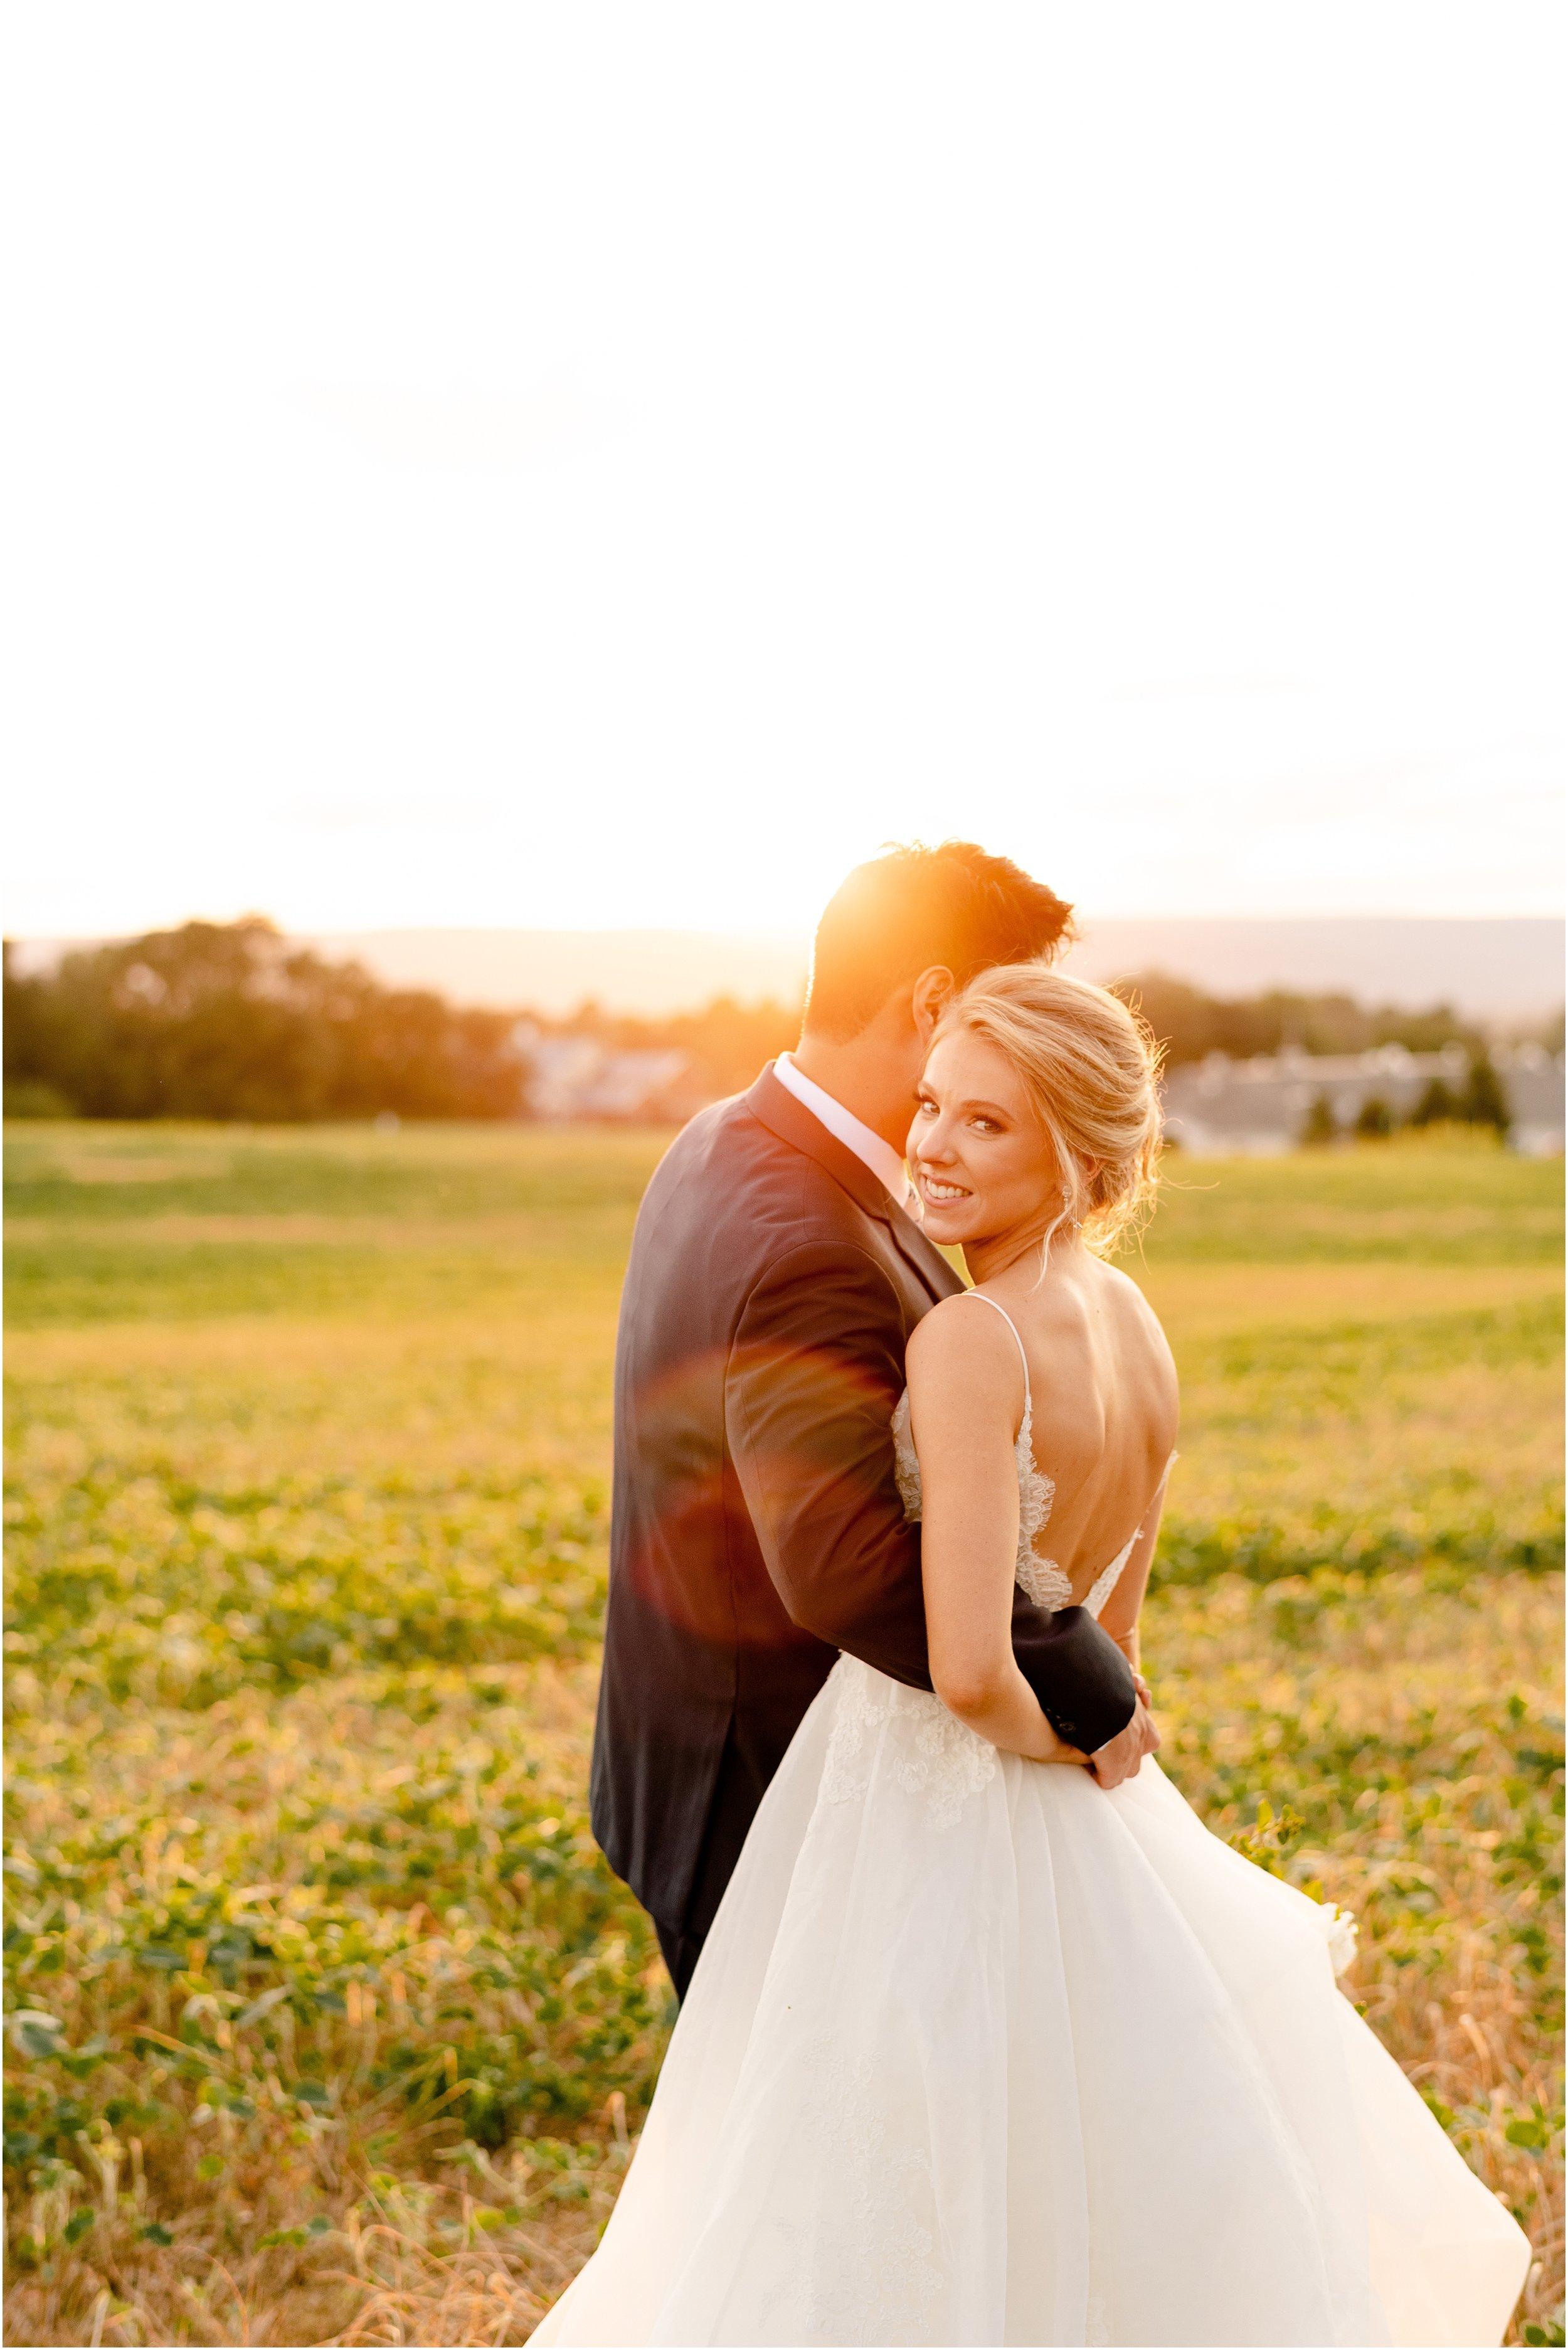 hannah leigh photography Walkers Overlook Wedding Walkersville MD_3560.jpg